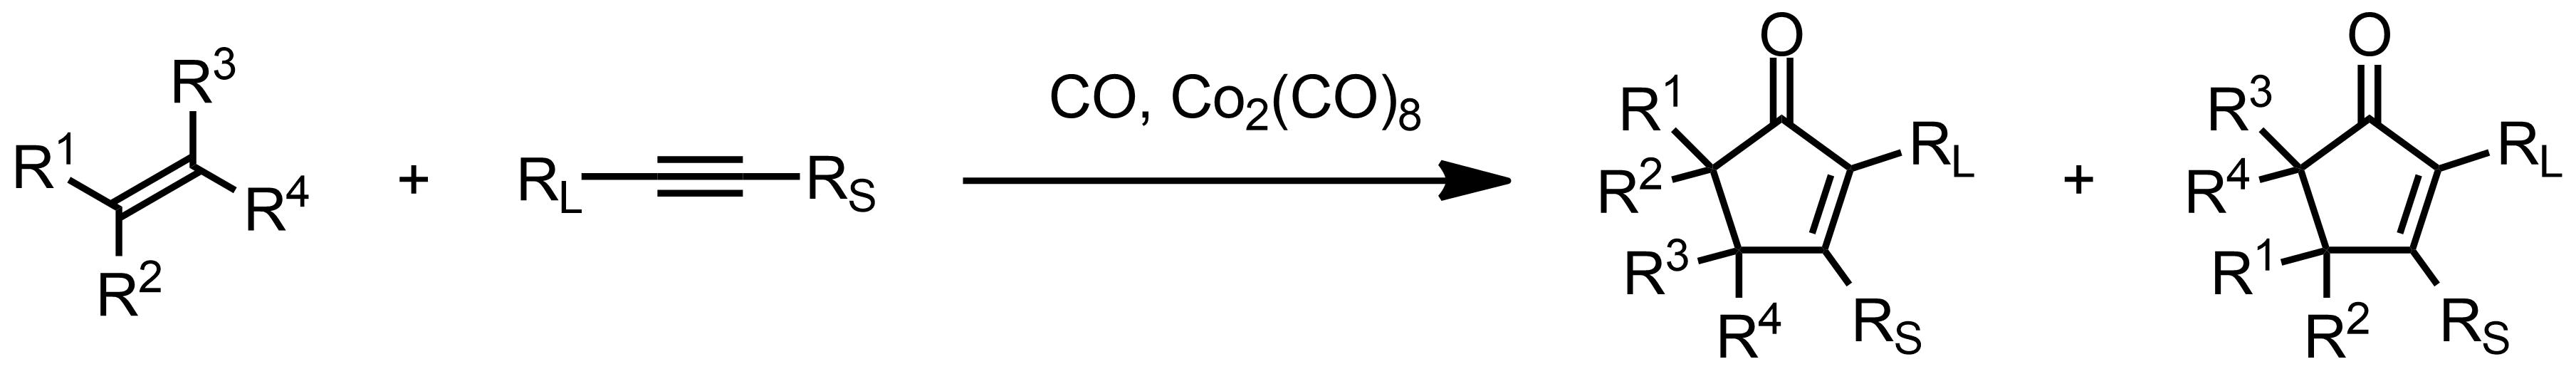 Schematic representation of the Pauson-Khand Reaction.